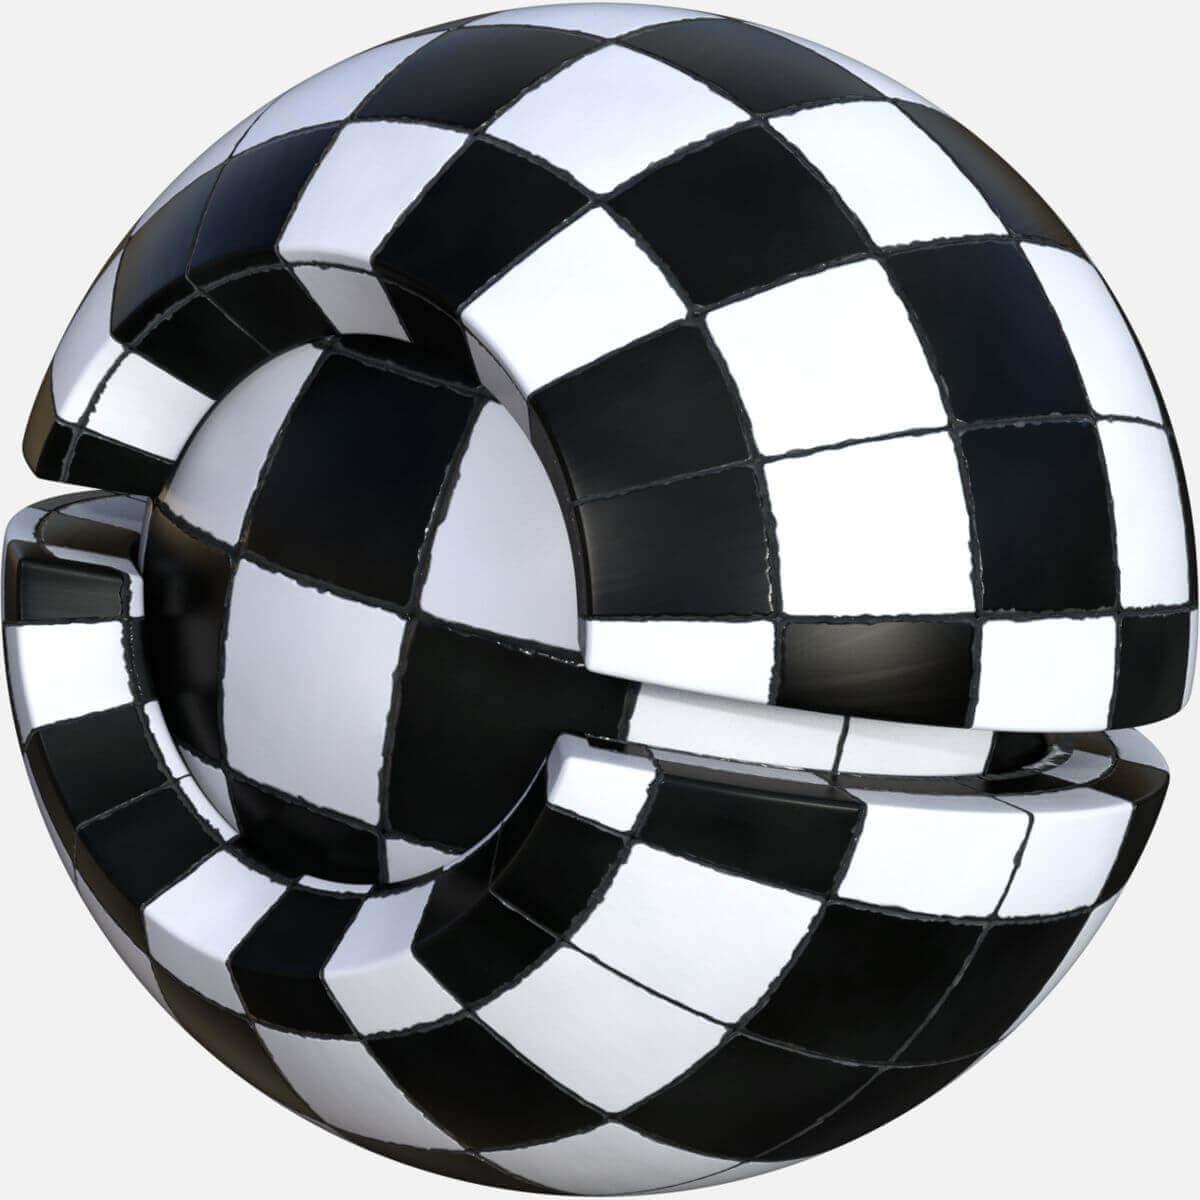 Stylized Checkered Floor Tiles Seamless Texture